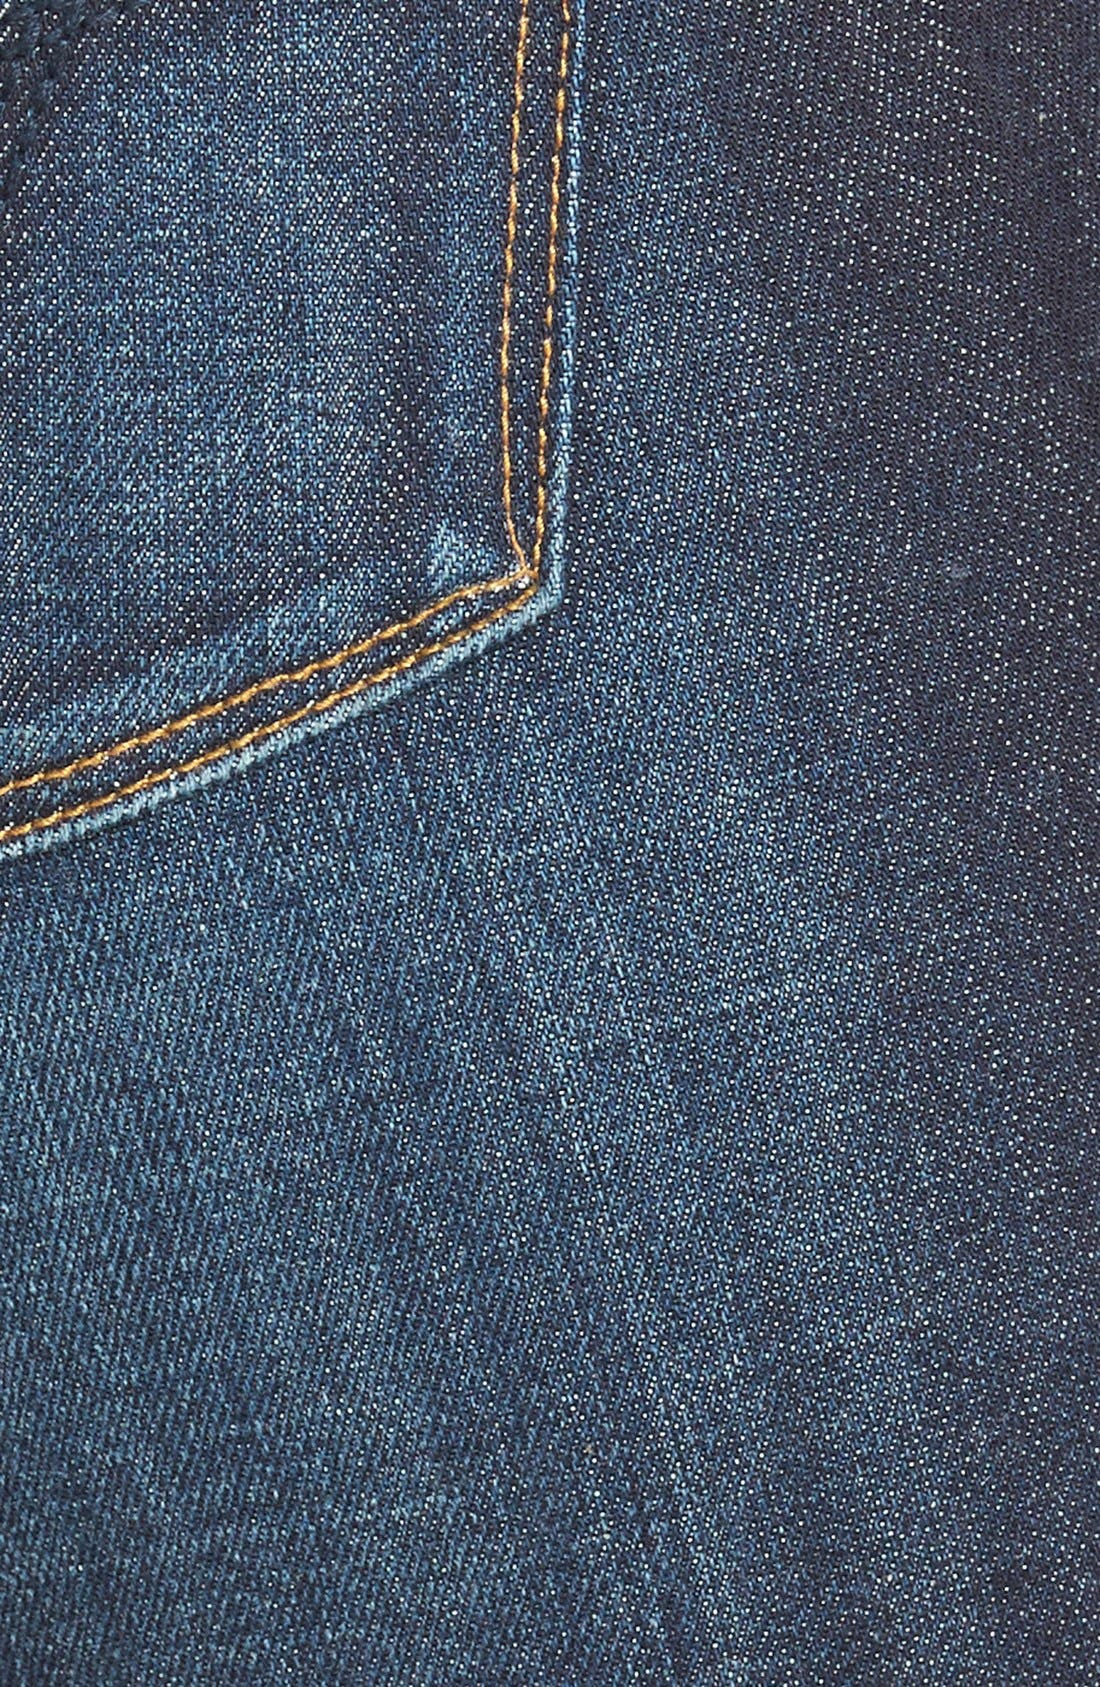 Alternate Image 3  - Vigoss 'Chelsea' Skinny Jeans (Dark Wash)